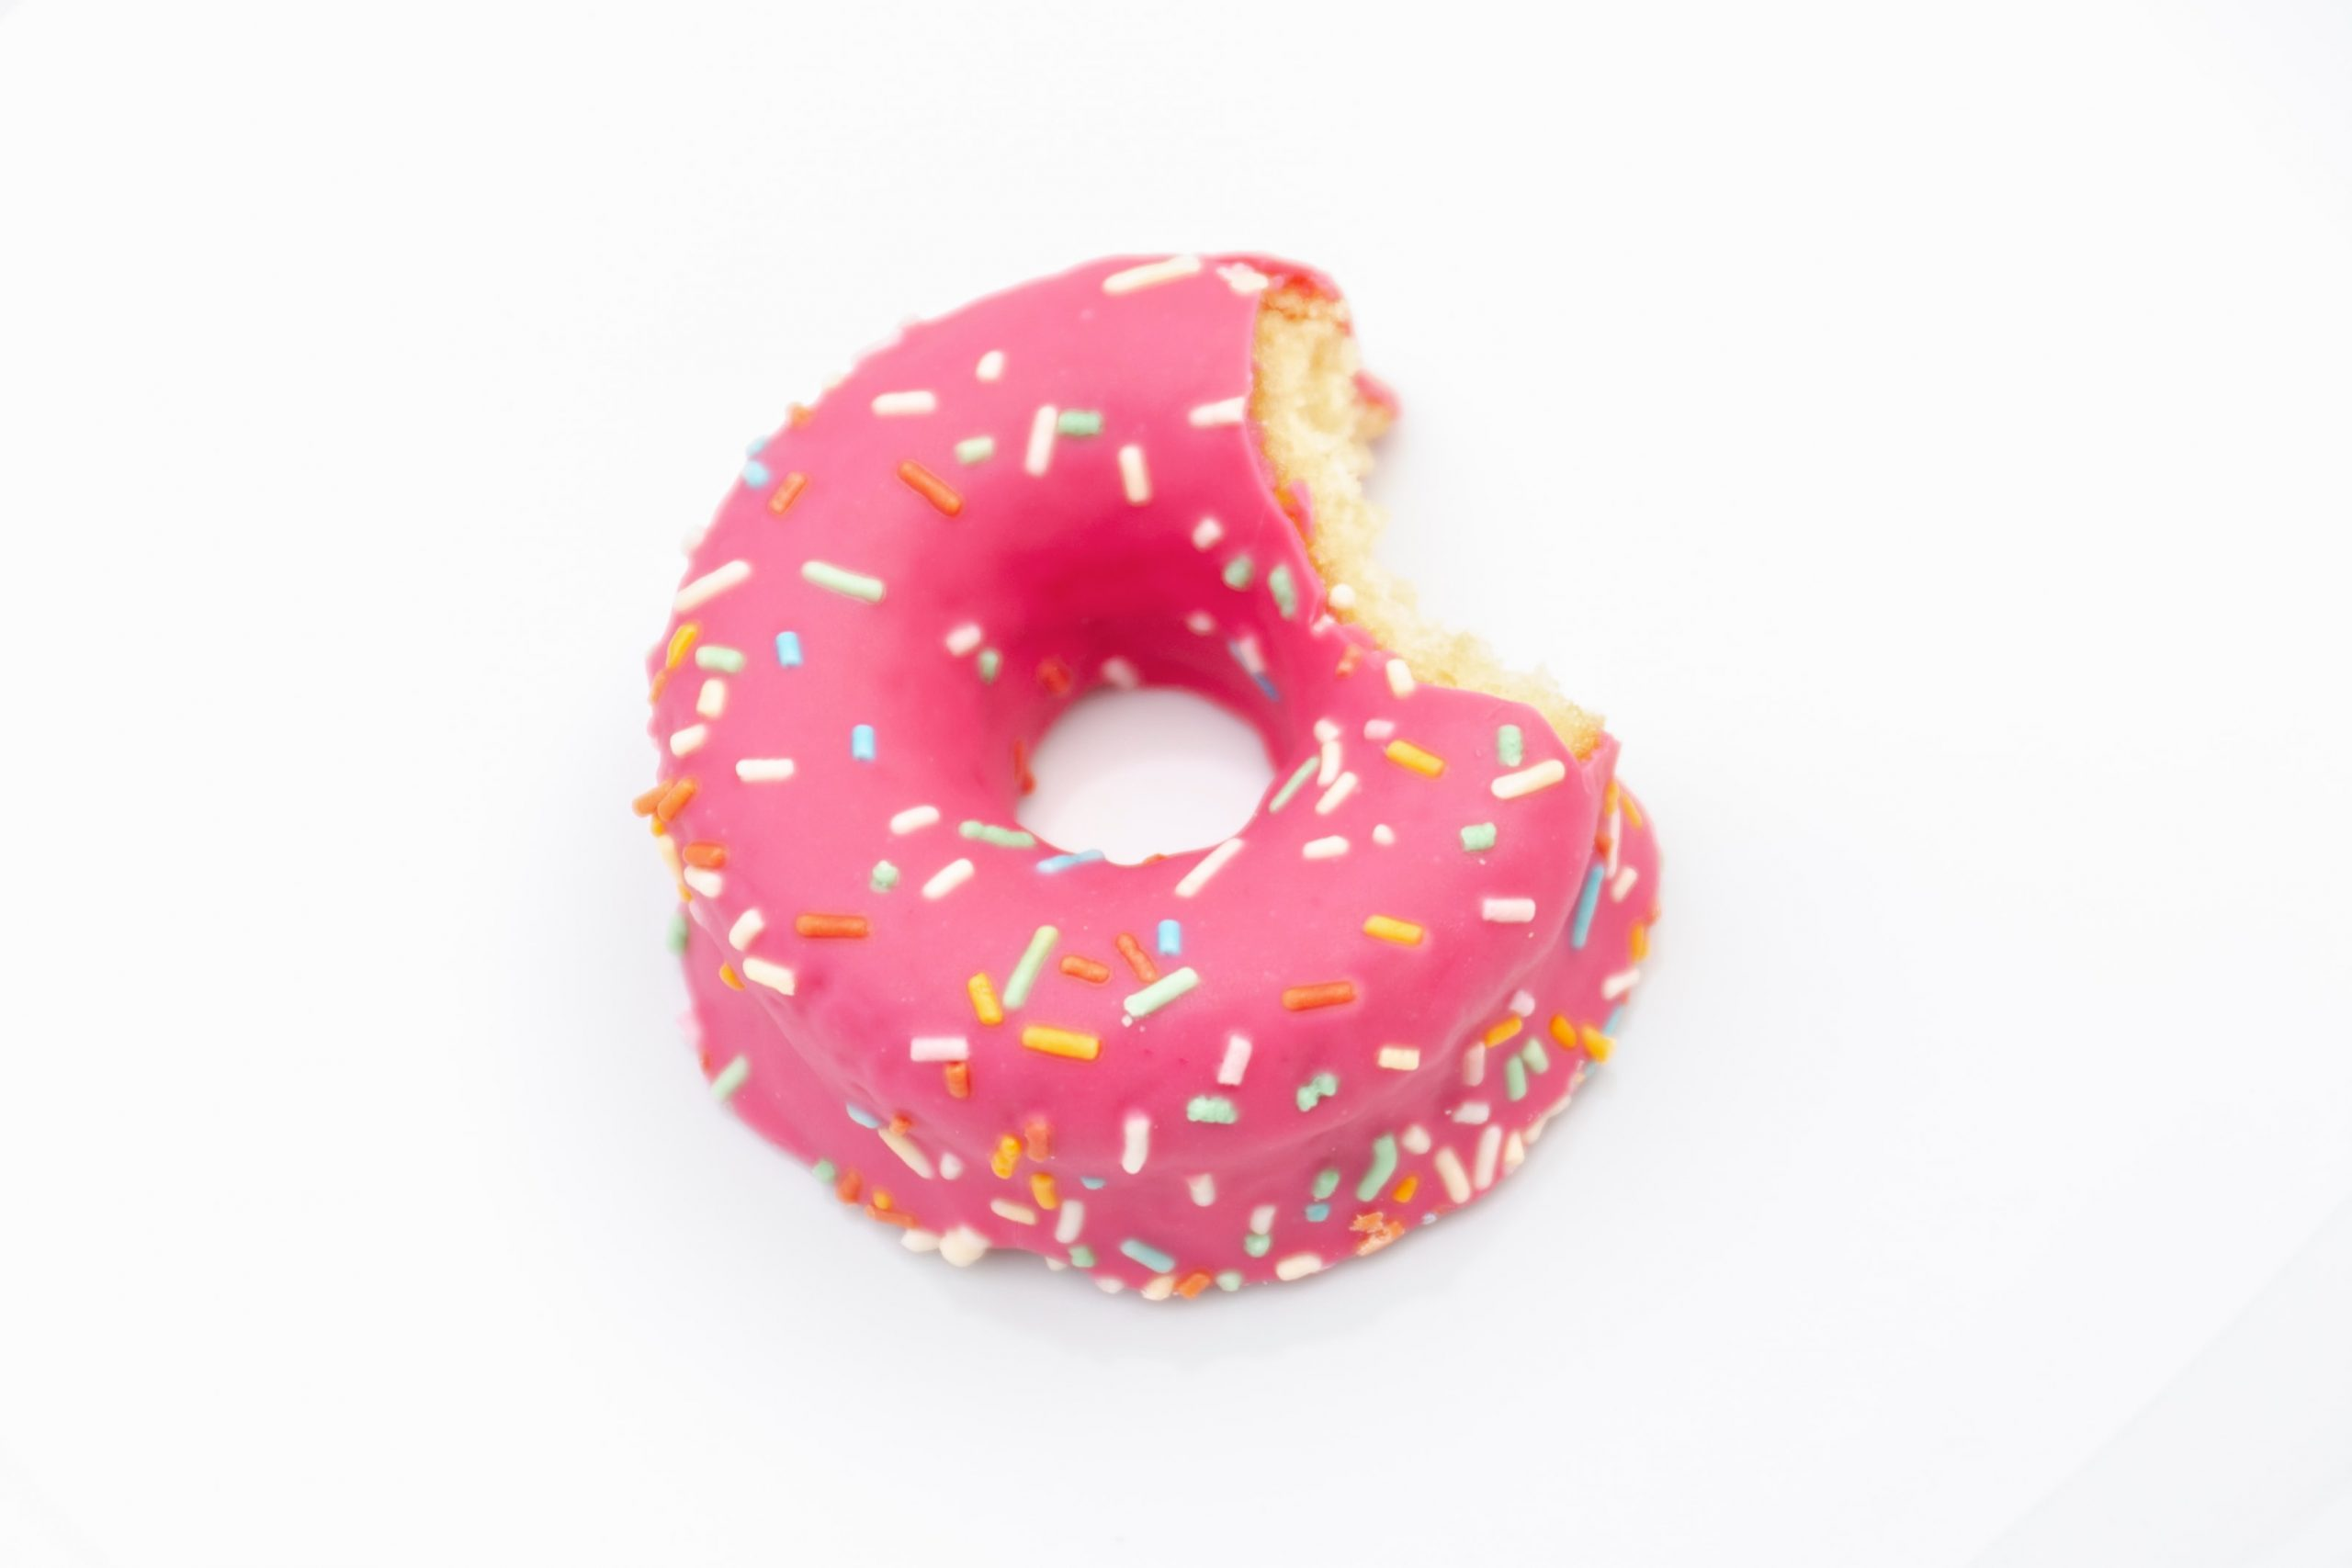 donut-rose-croque